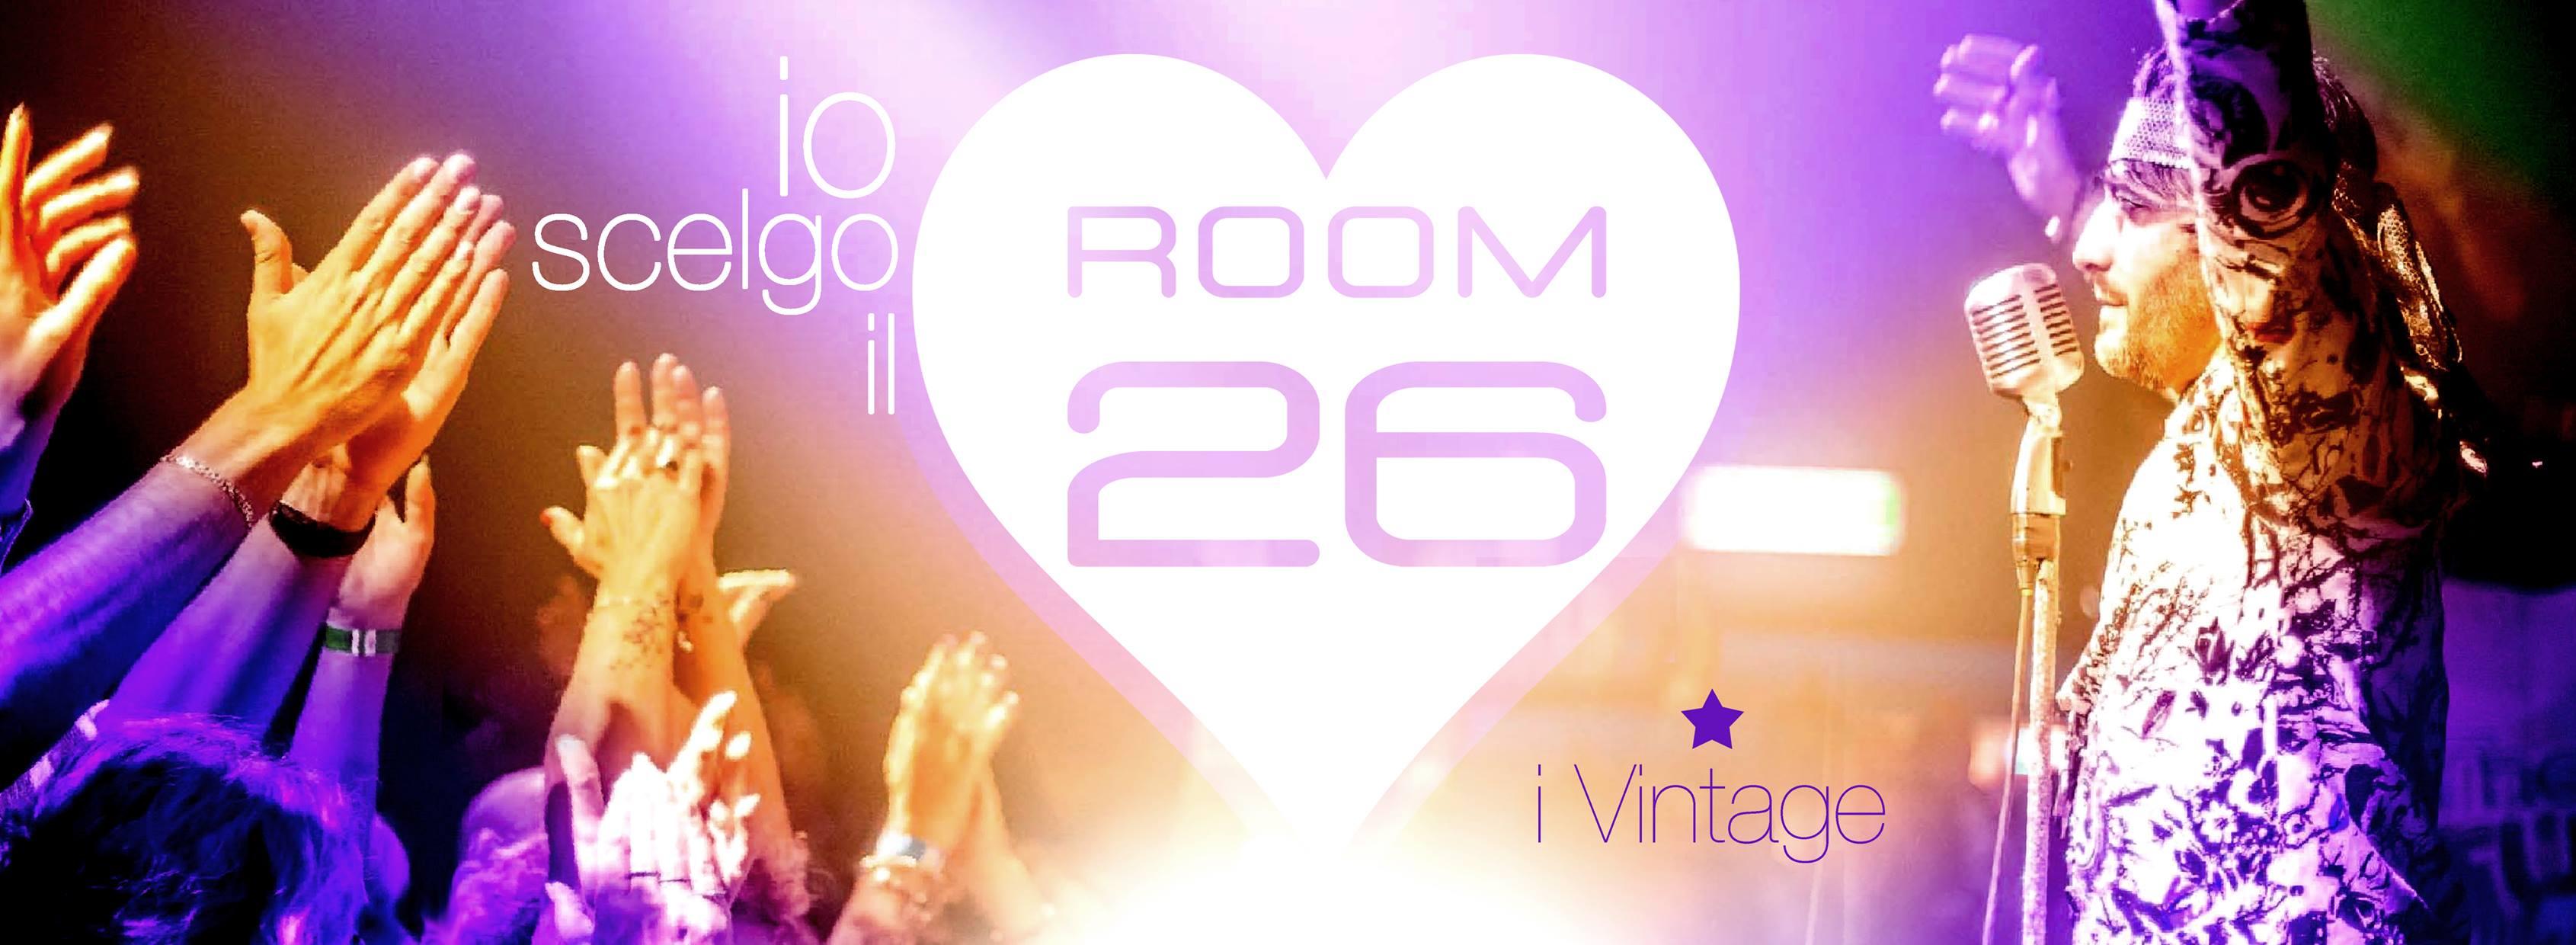 Room 26 venerdì 7 aprile 2017 serata Vintage a Roma